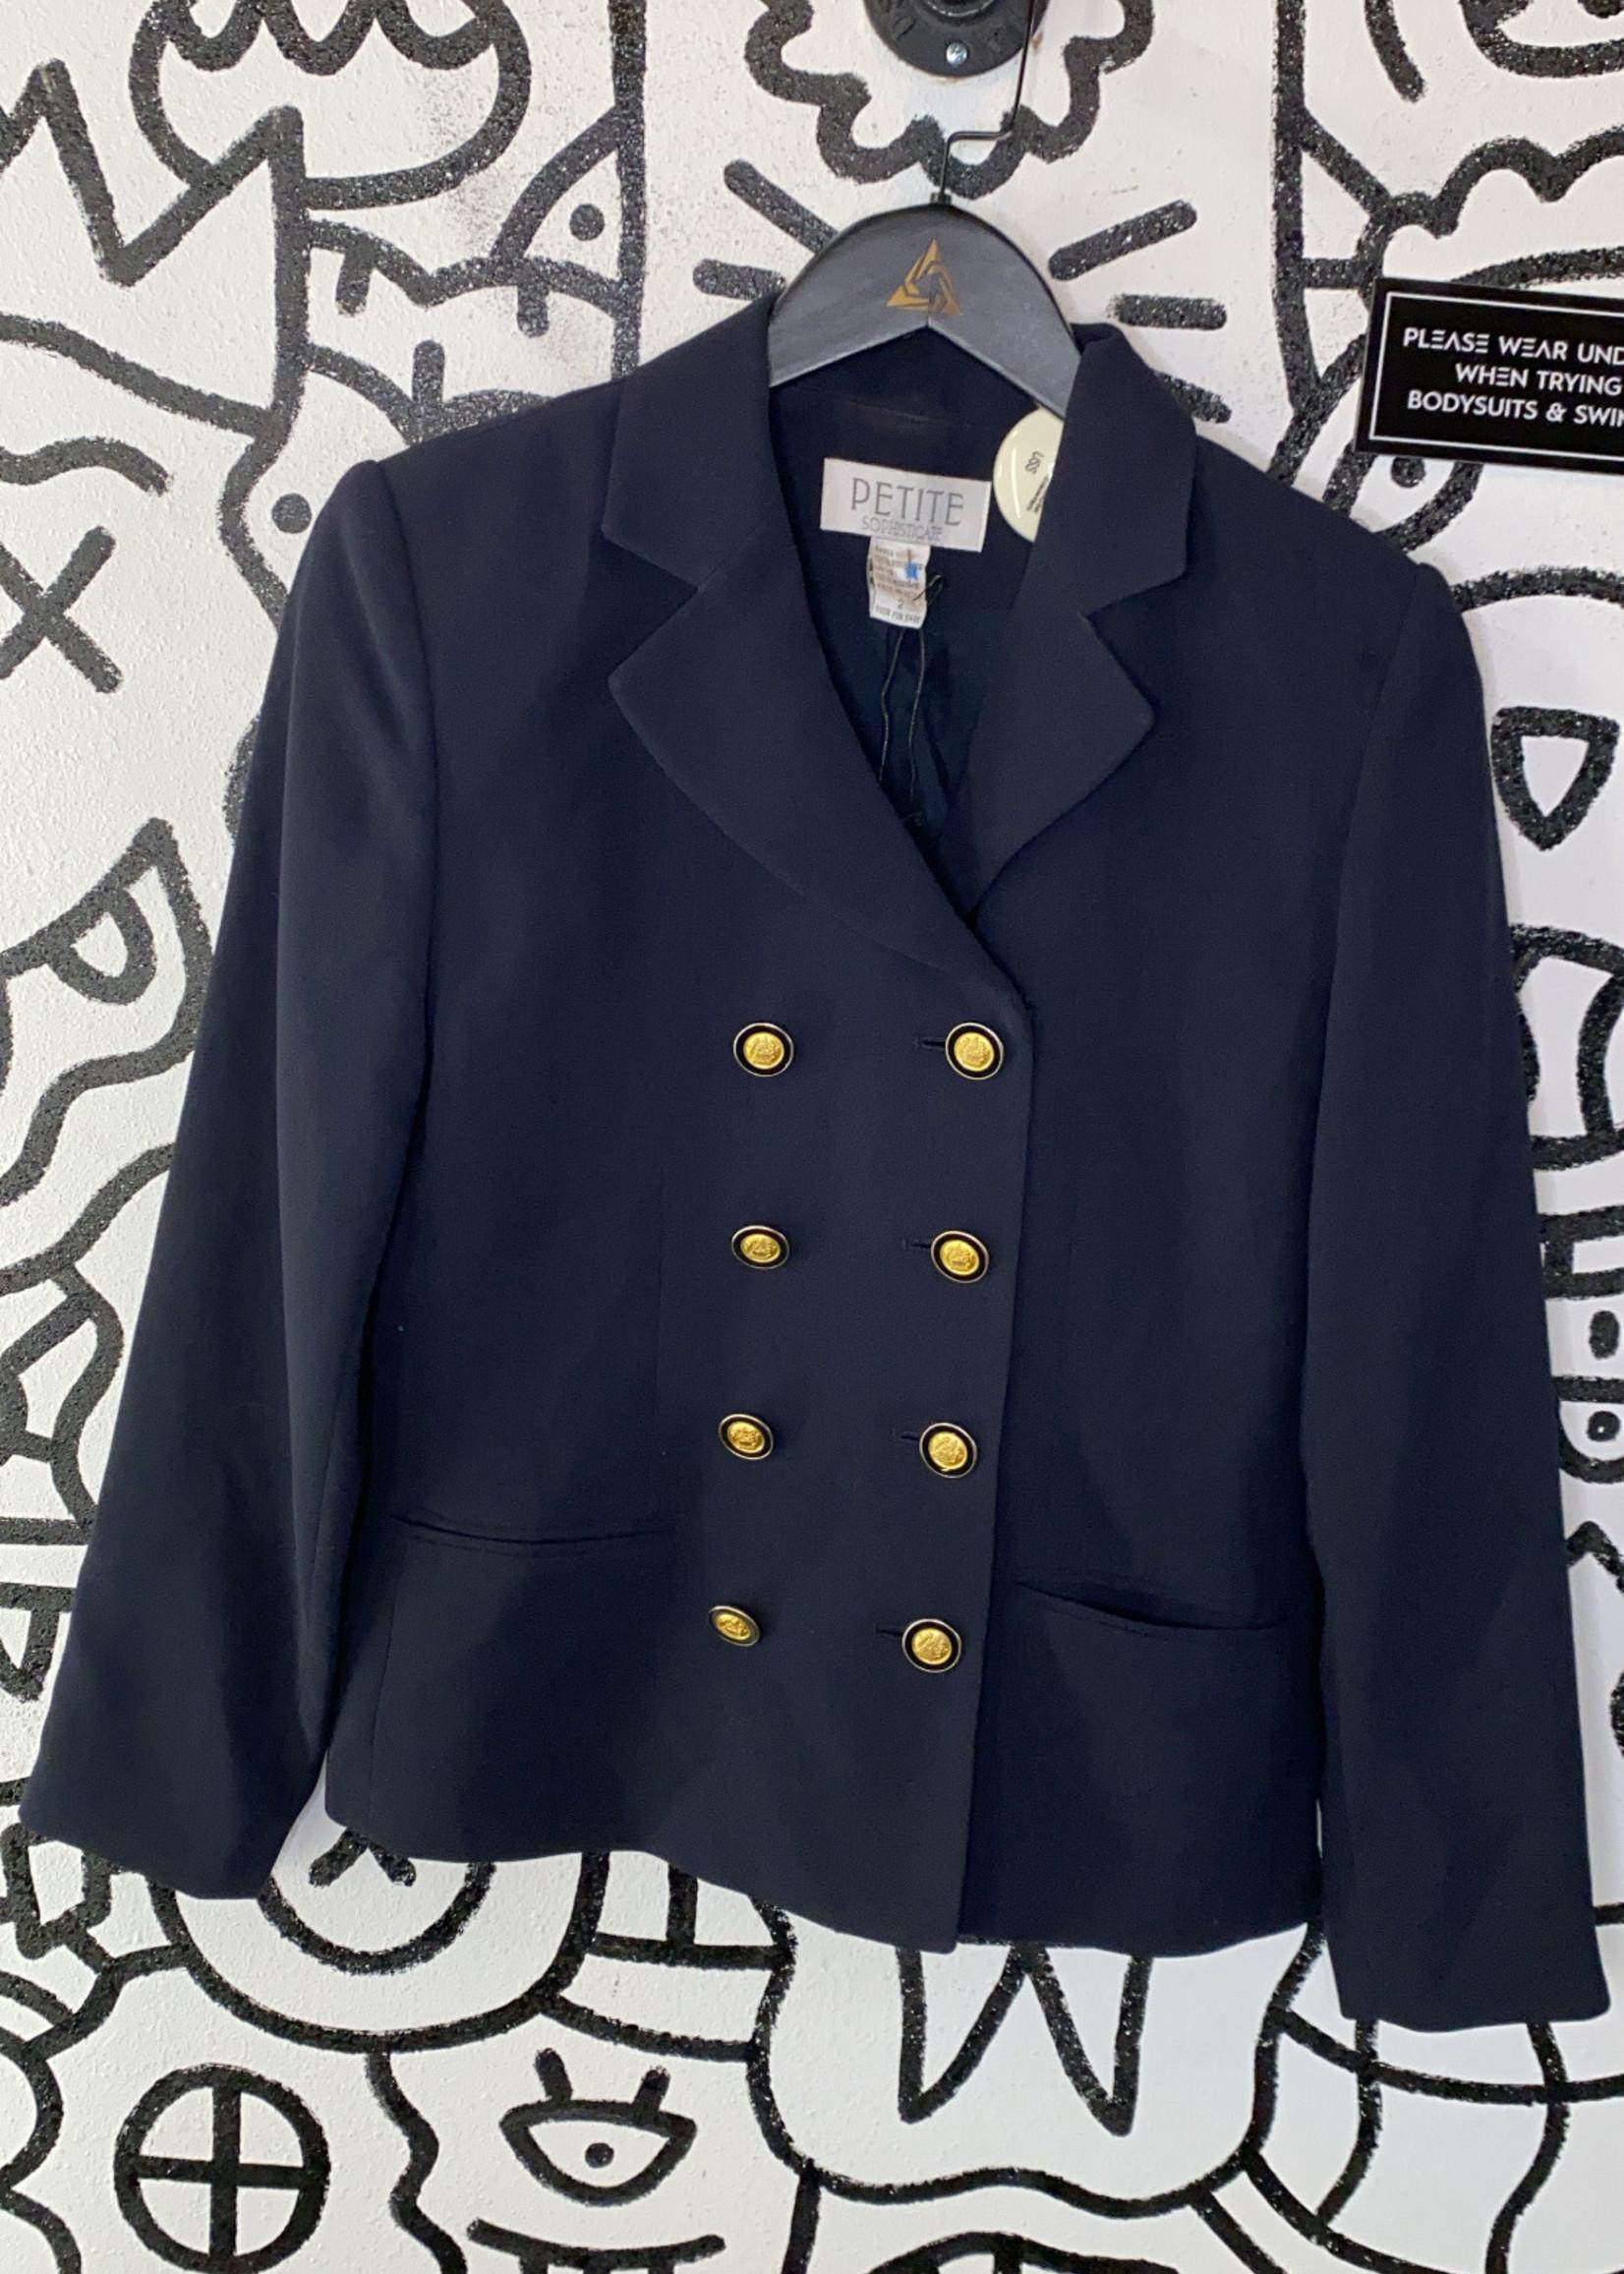 Petite Sophisticate Navy Button Blazer 2/XS